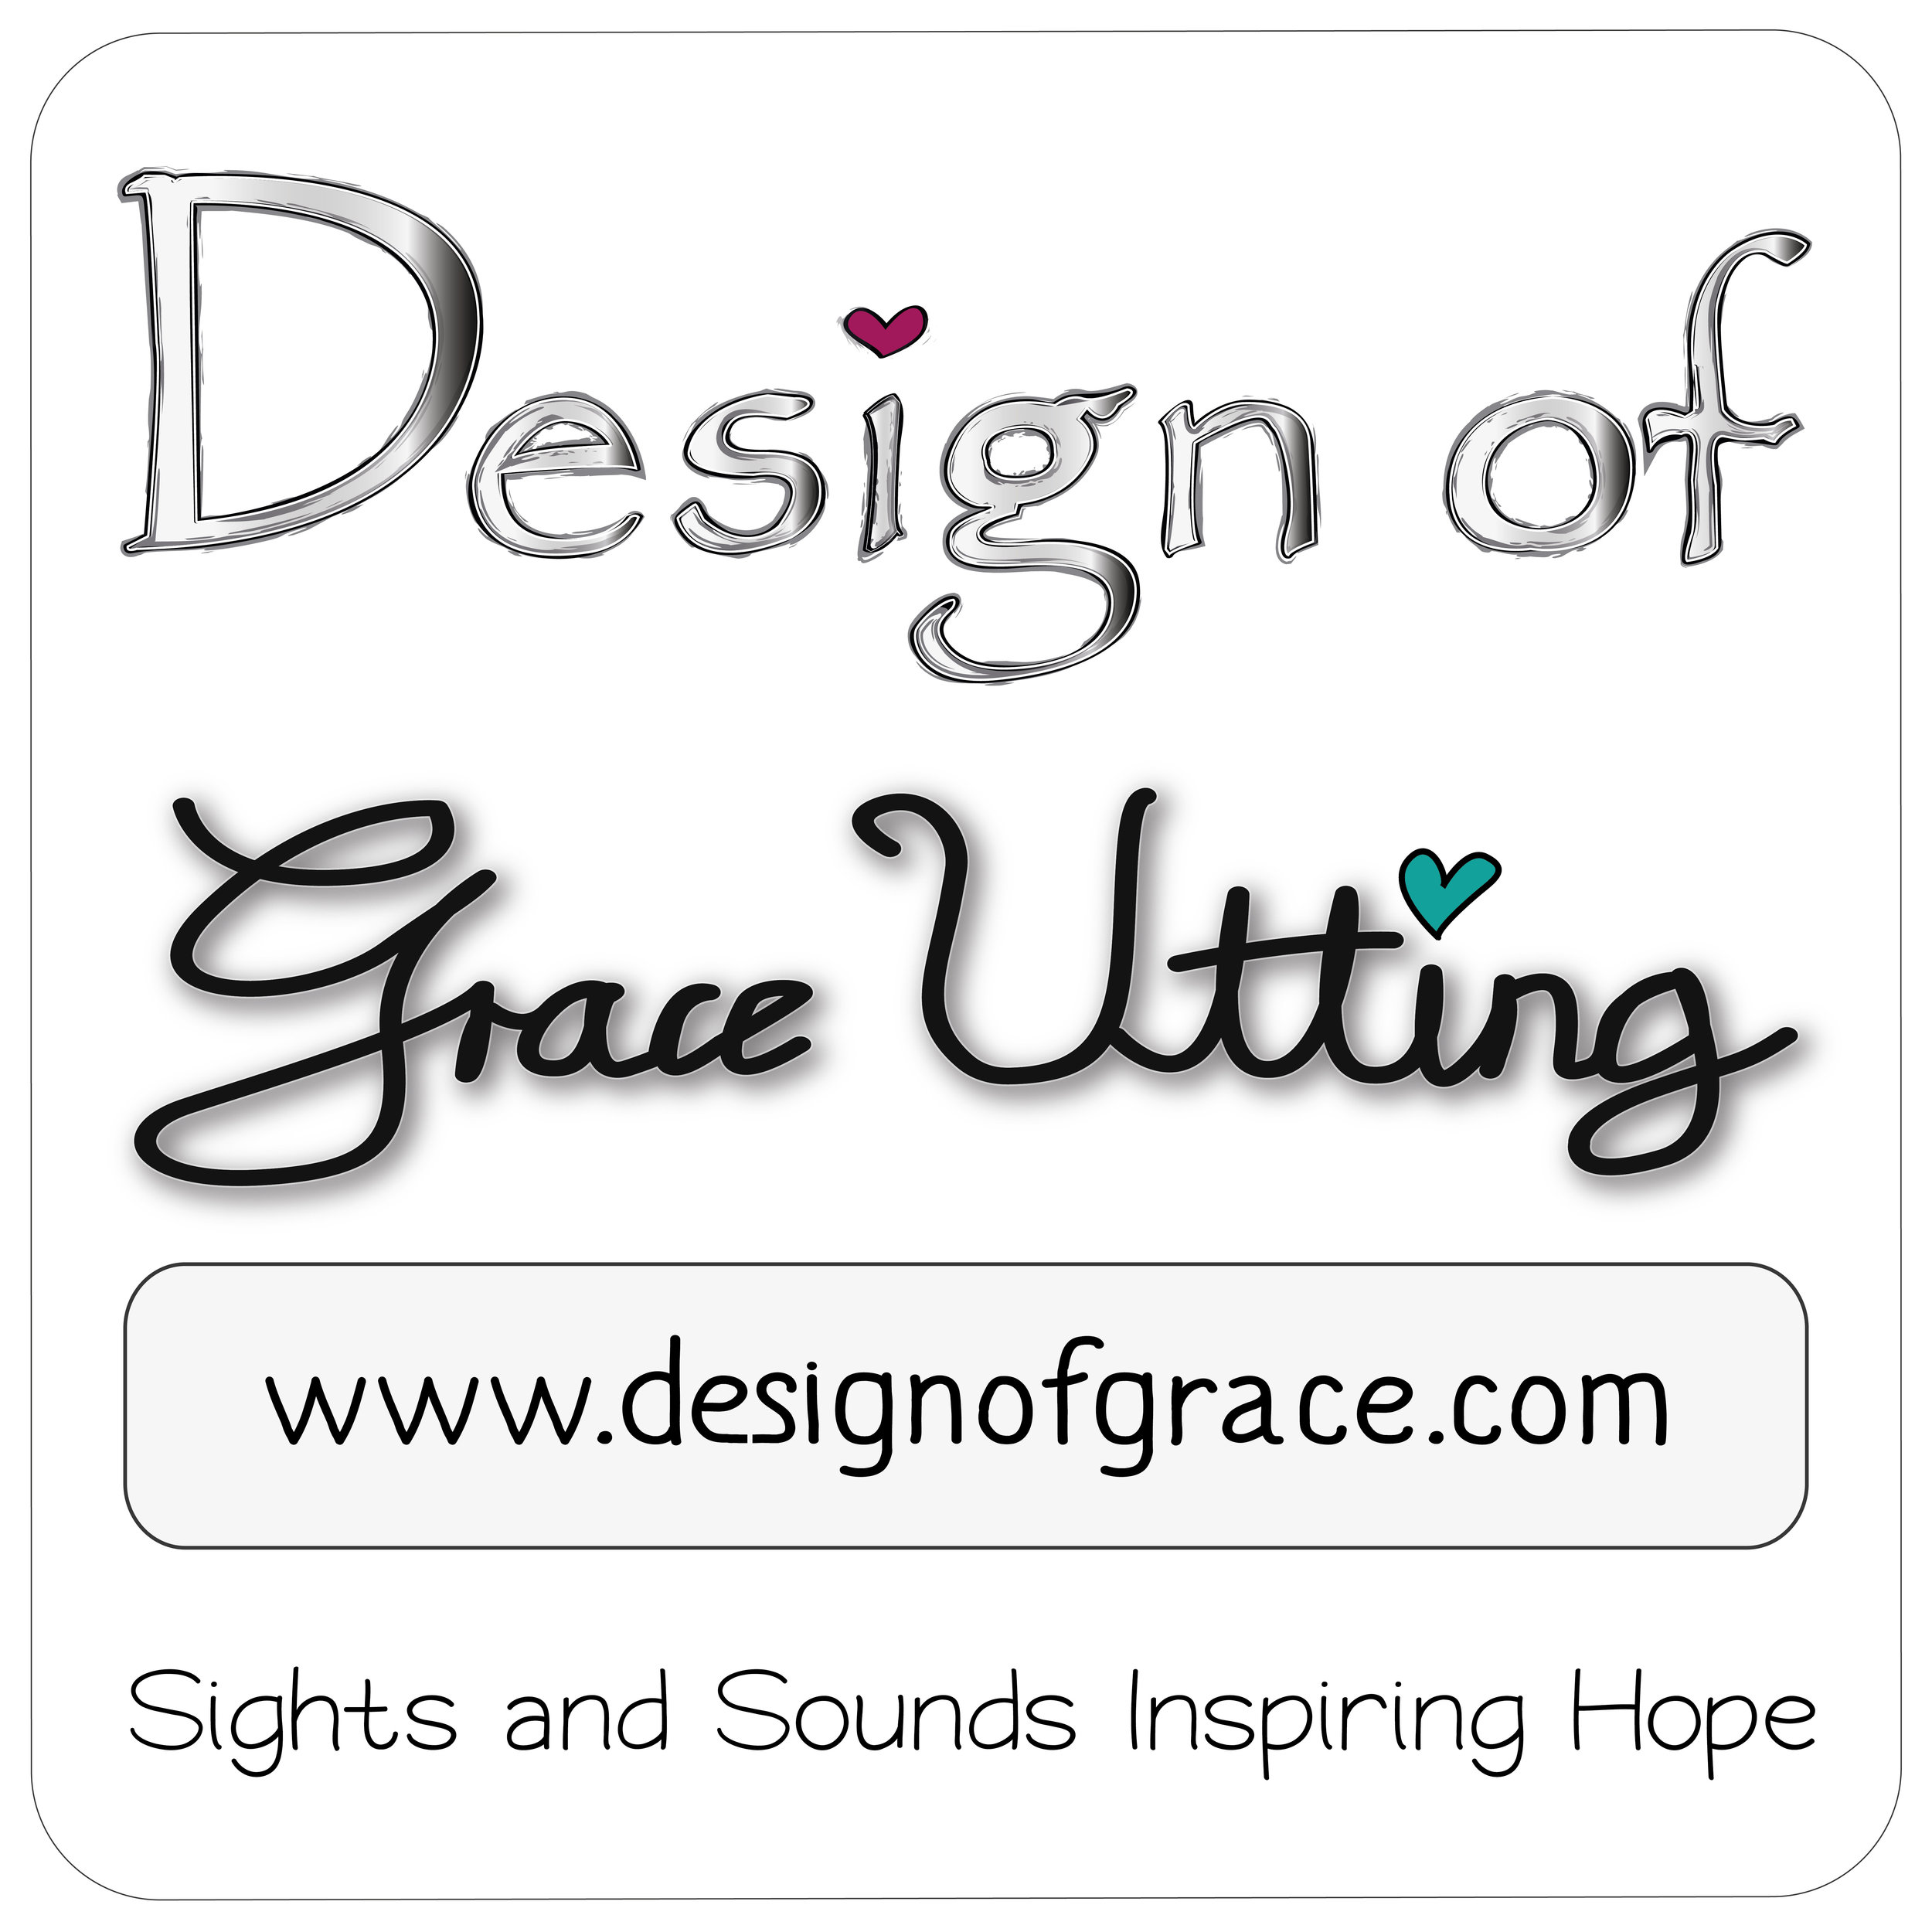 designiofgrace_logo_square_550_x_550.jpg